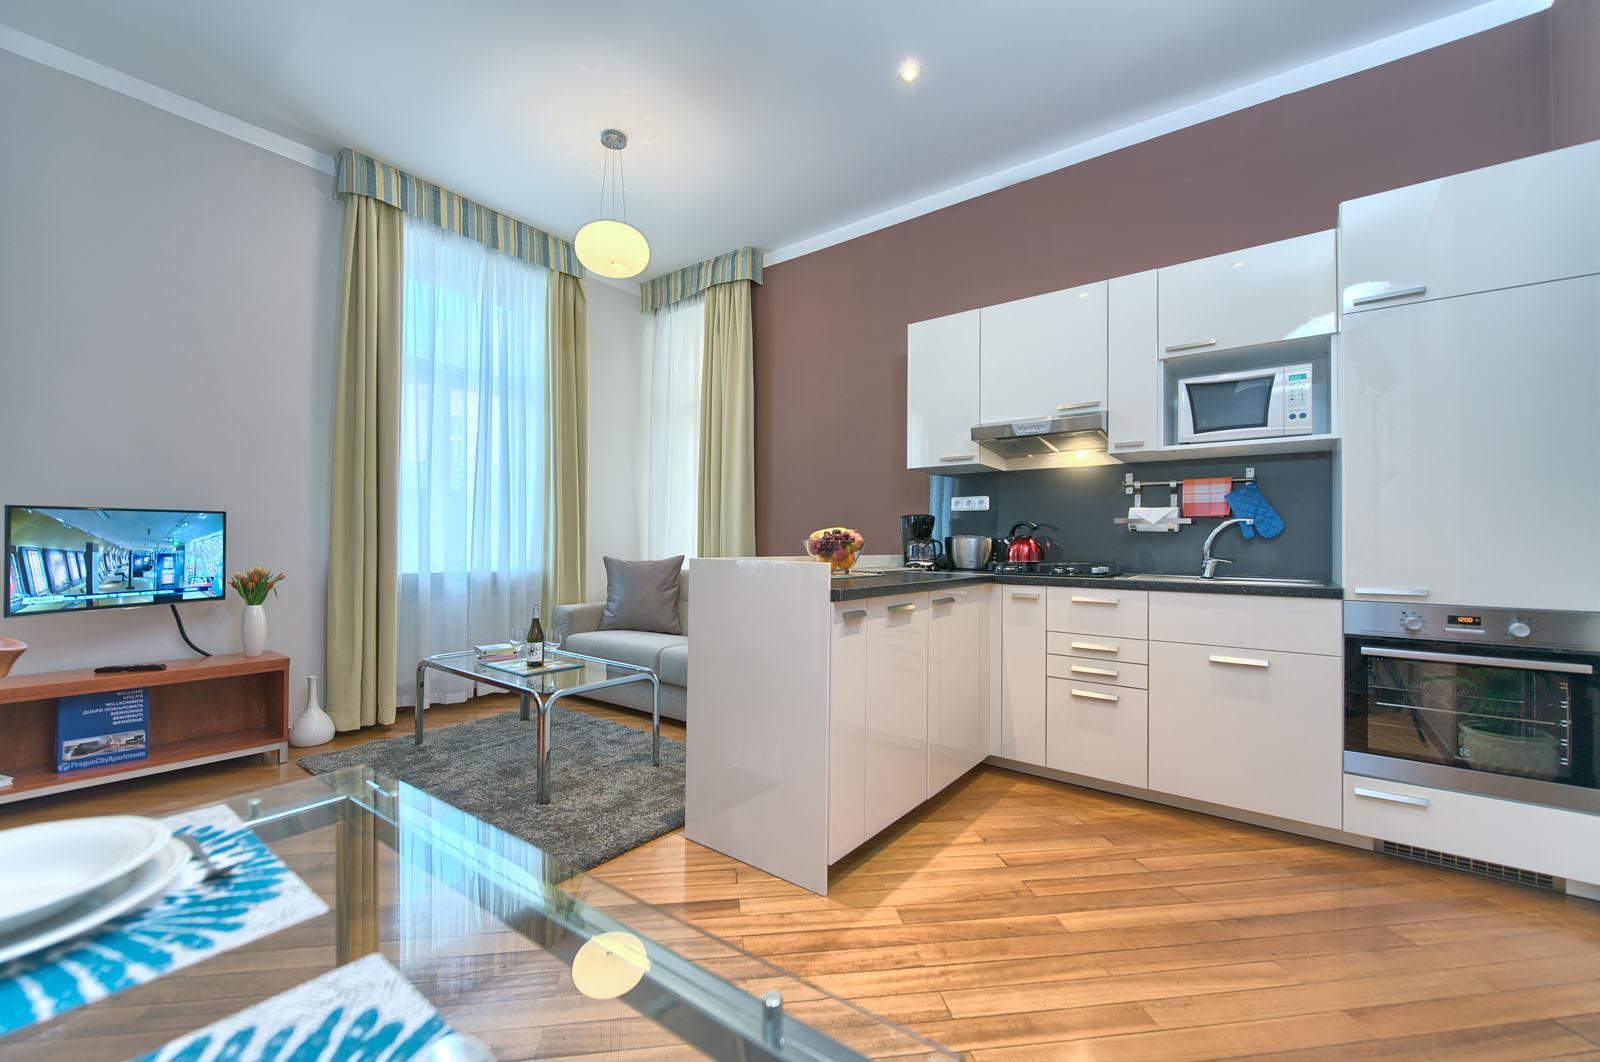 captivating studio apartment one room kitchen   Spacious studio rent in Prague with high value